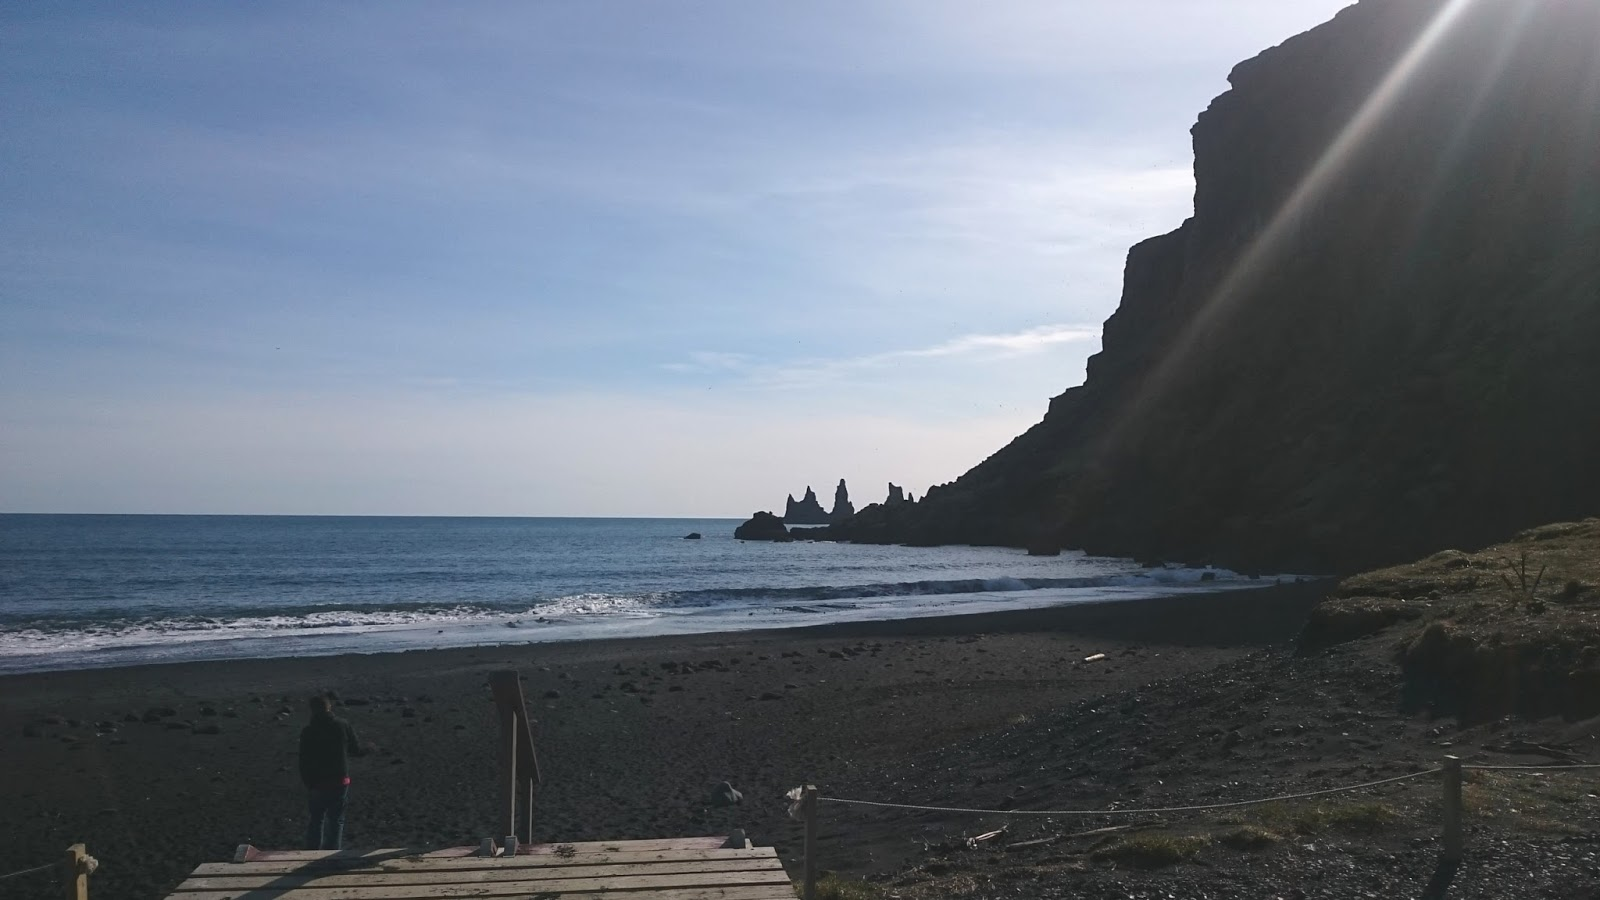 plaża w Viku, miasteczko Vik, islandzkie miasteczko, Islandia